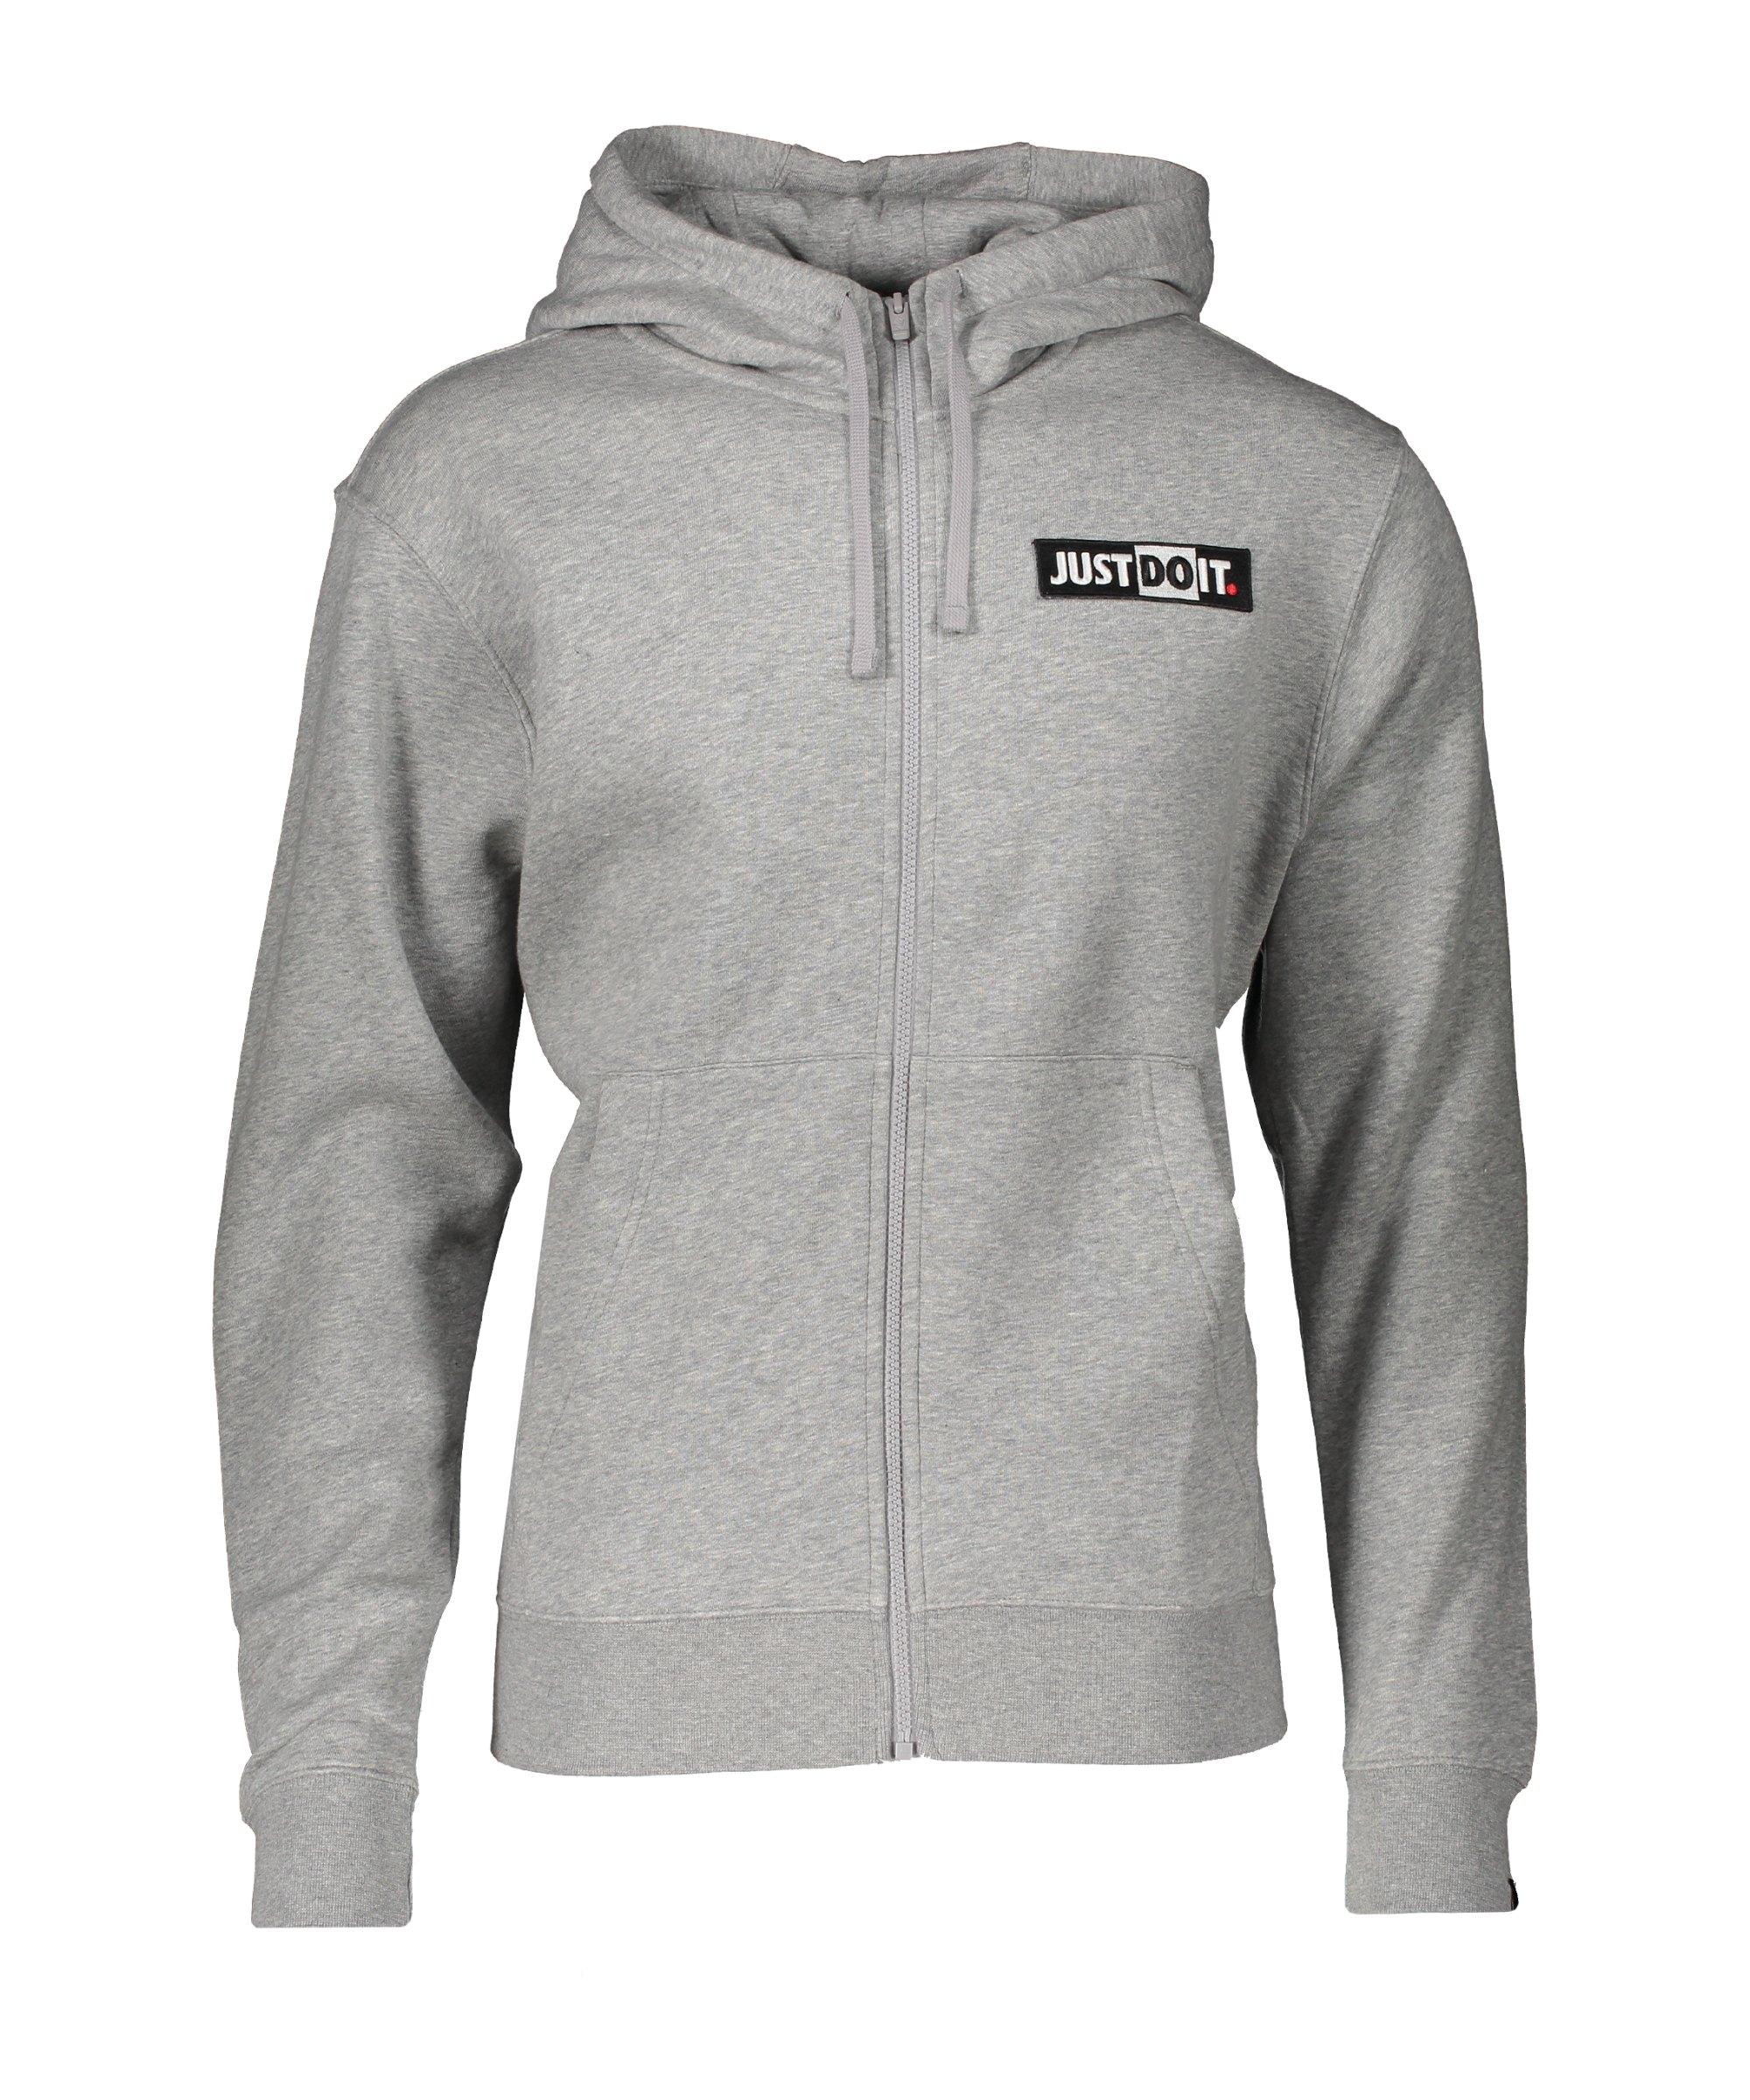 Nike Just Do It Kapuzenjacke Grau F063 - grau